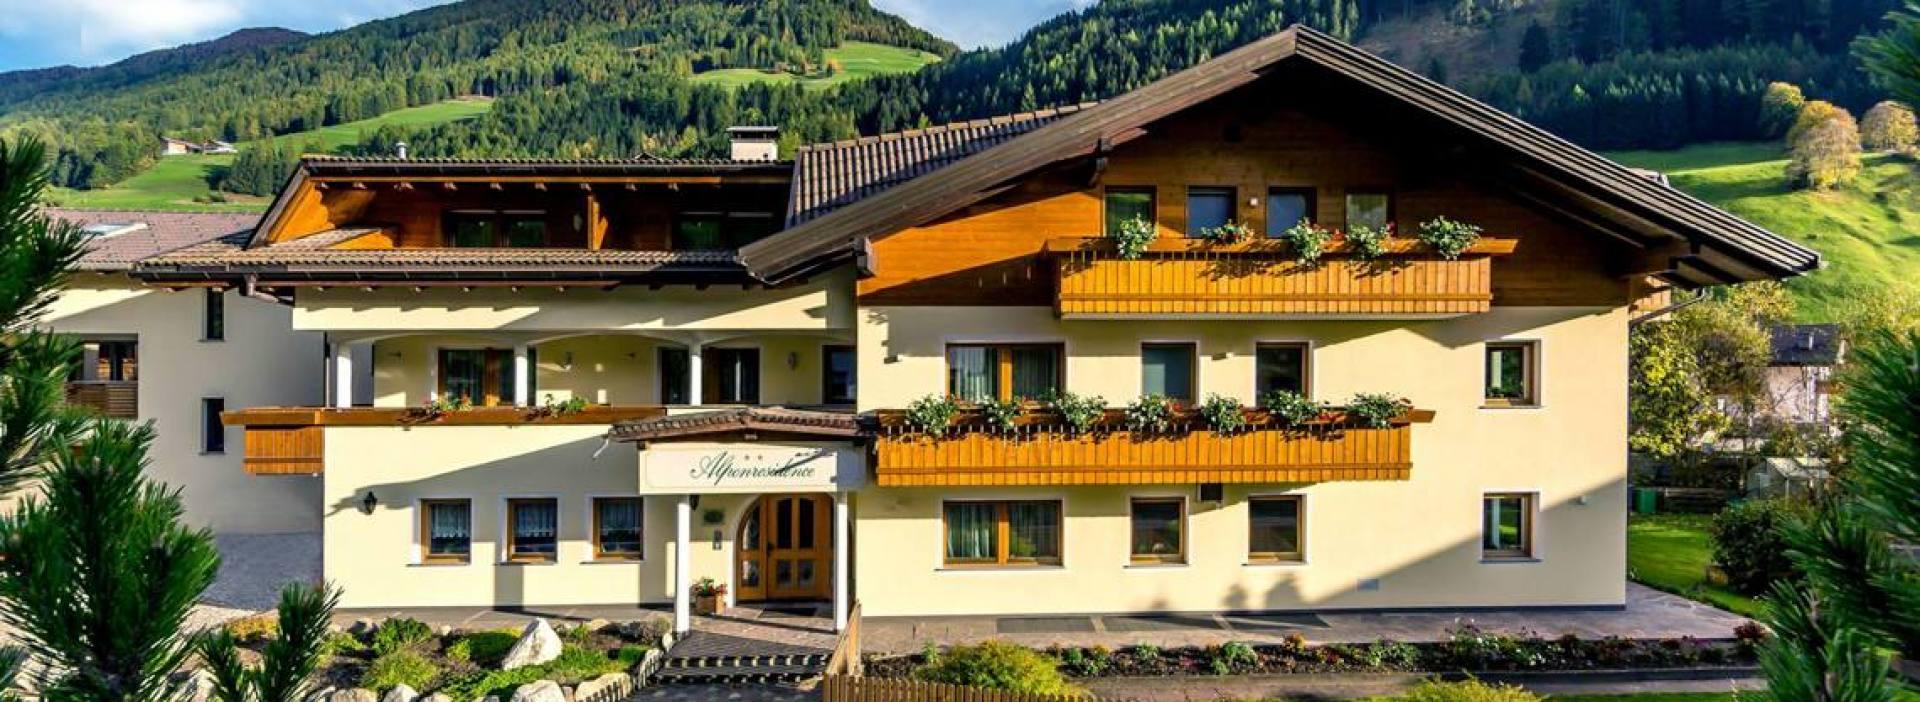 Garni Alpenresidence